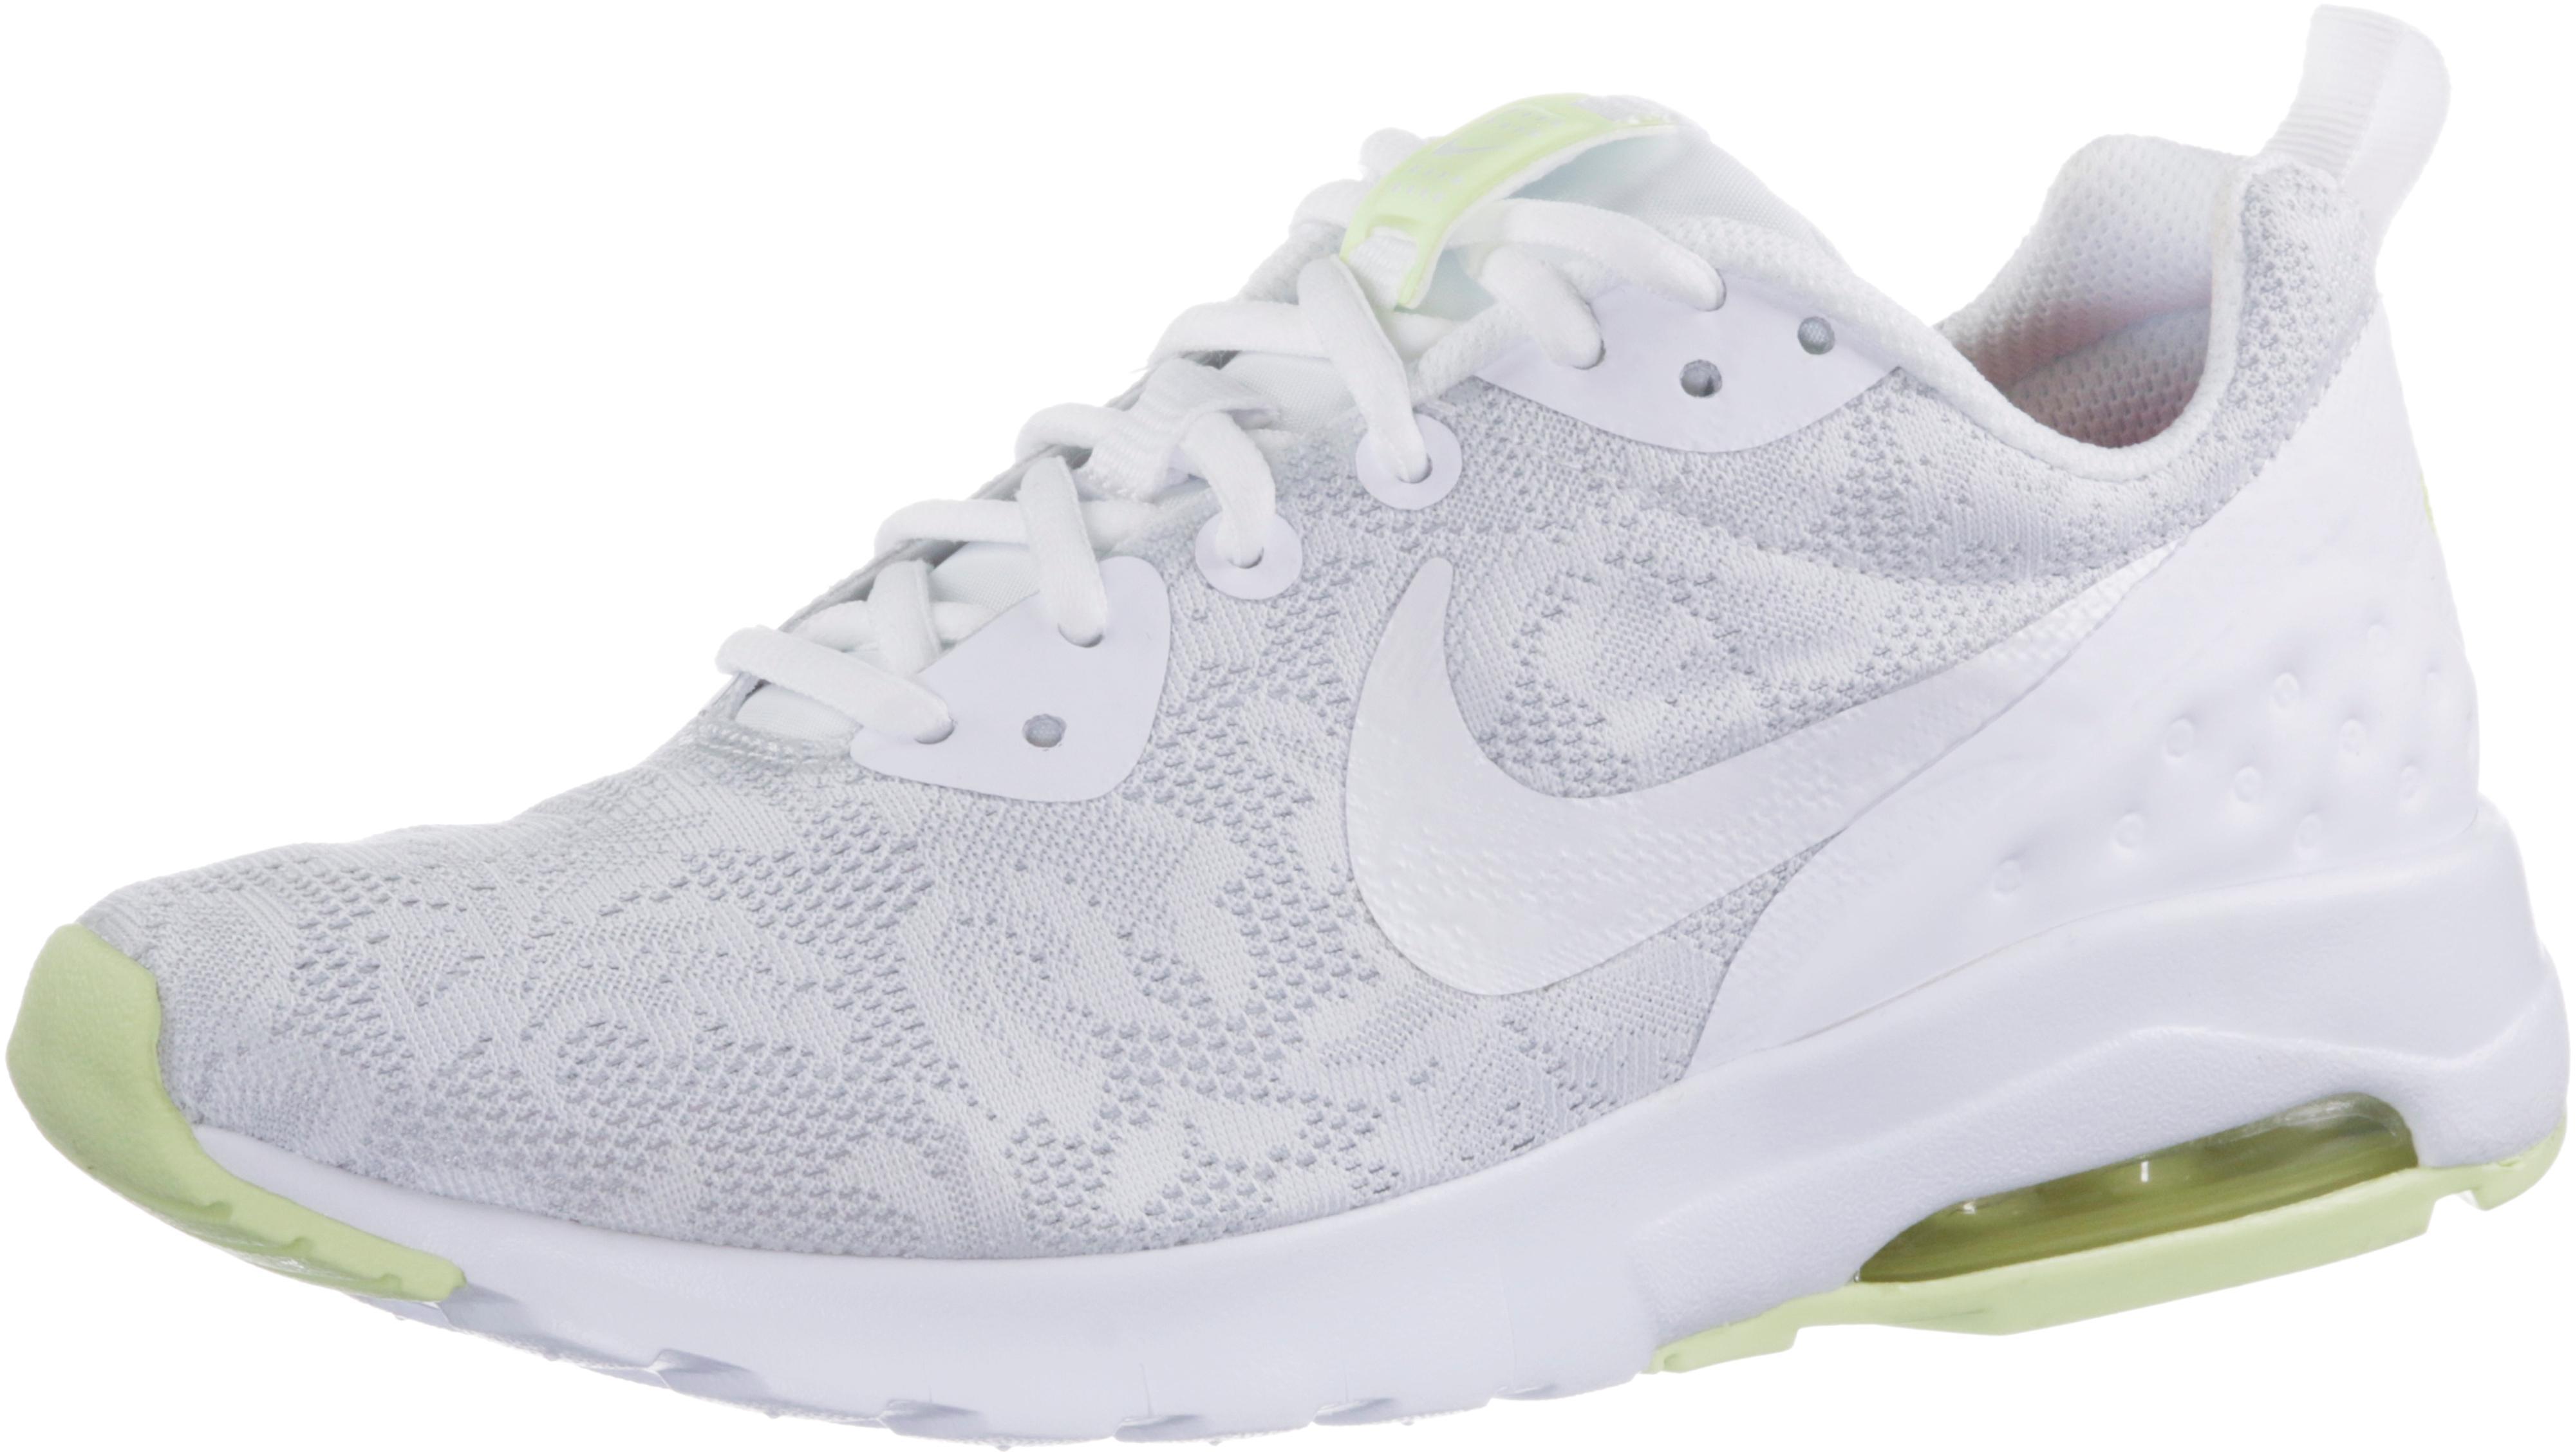 Nike Air Max Motion LW SE Sneaker Men grey at Sport Bittl Shop